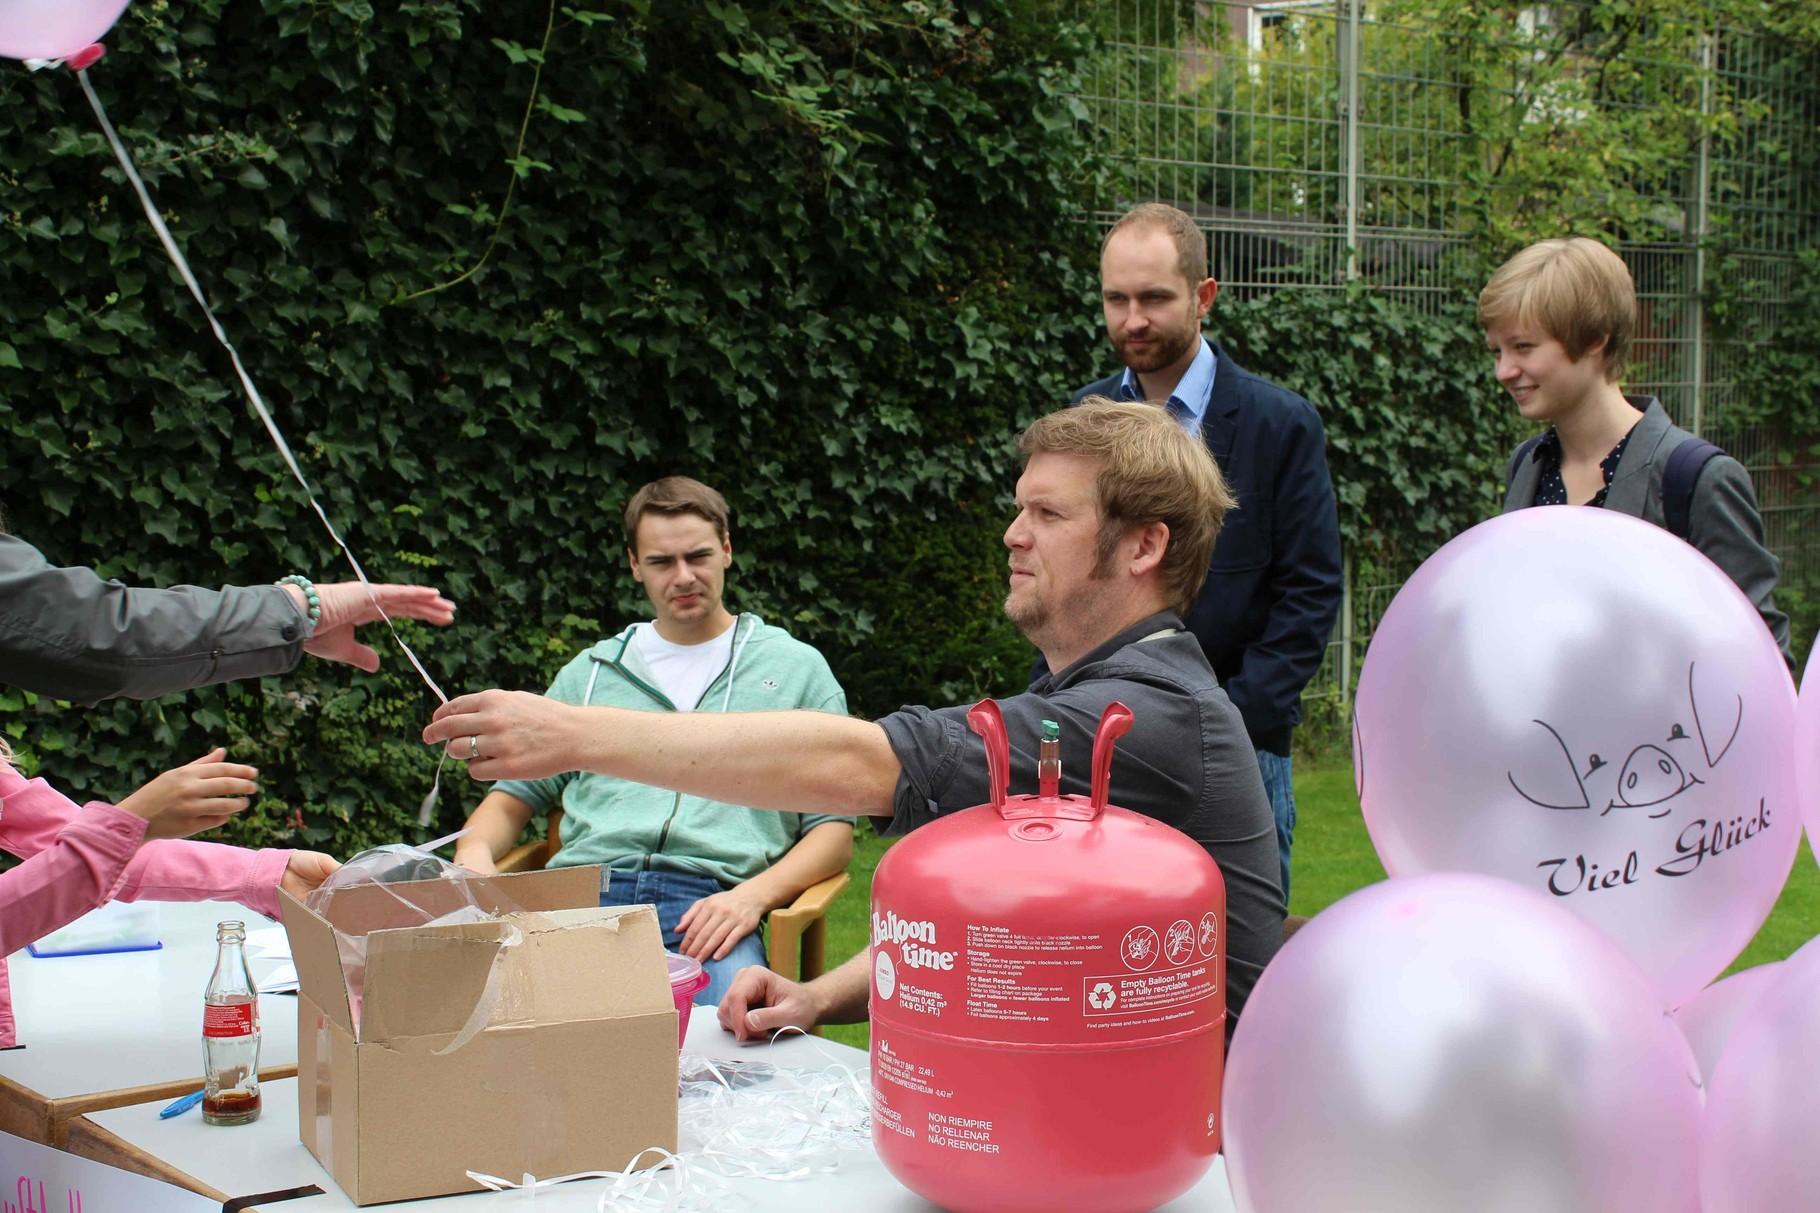 Christoph verteilt Ballons